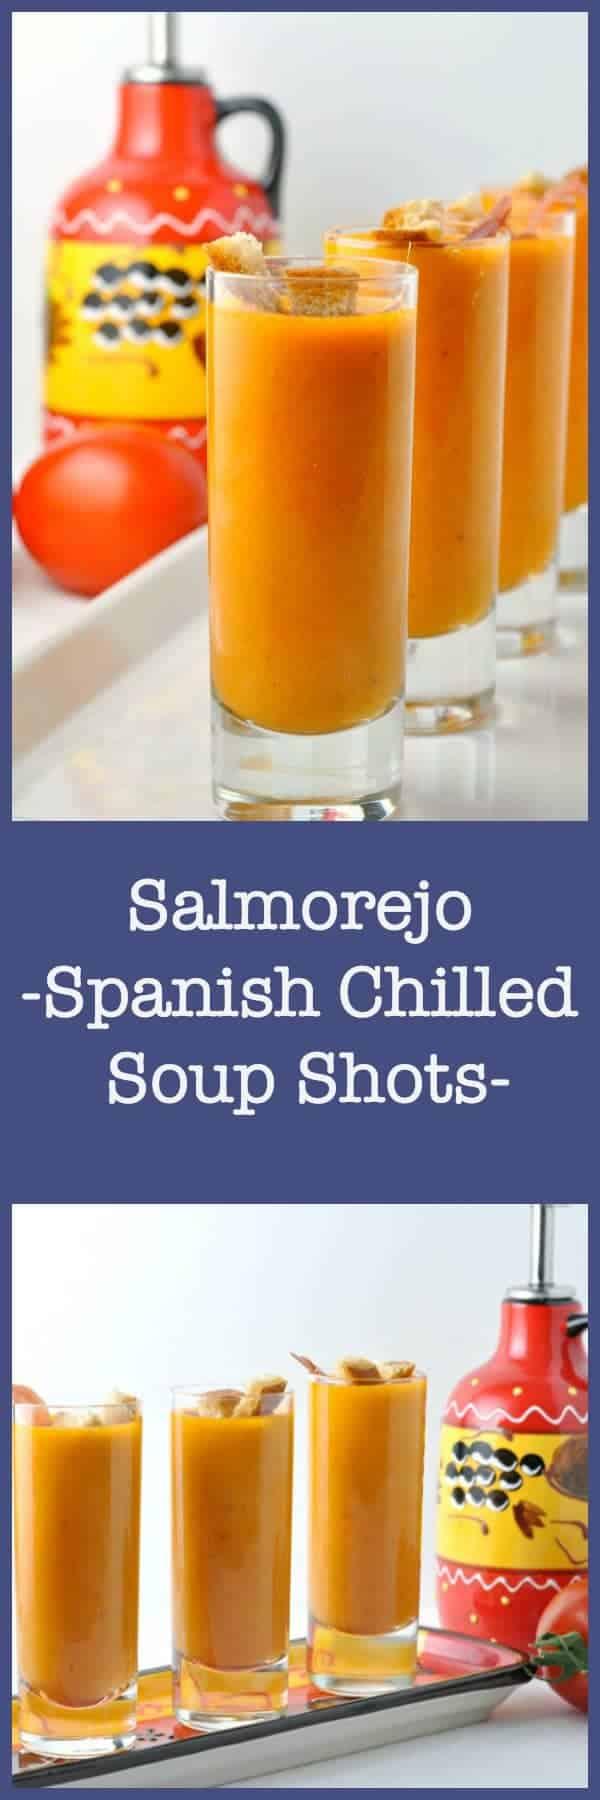 Soup Shots for summer! Spanish chilled soup |www.flavourandsavour.com